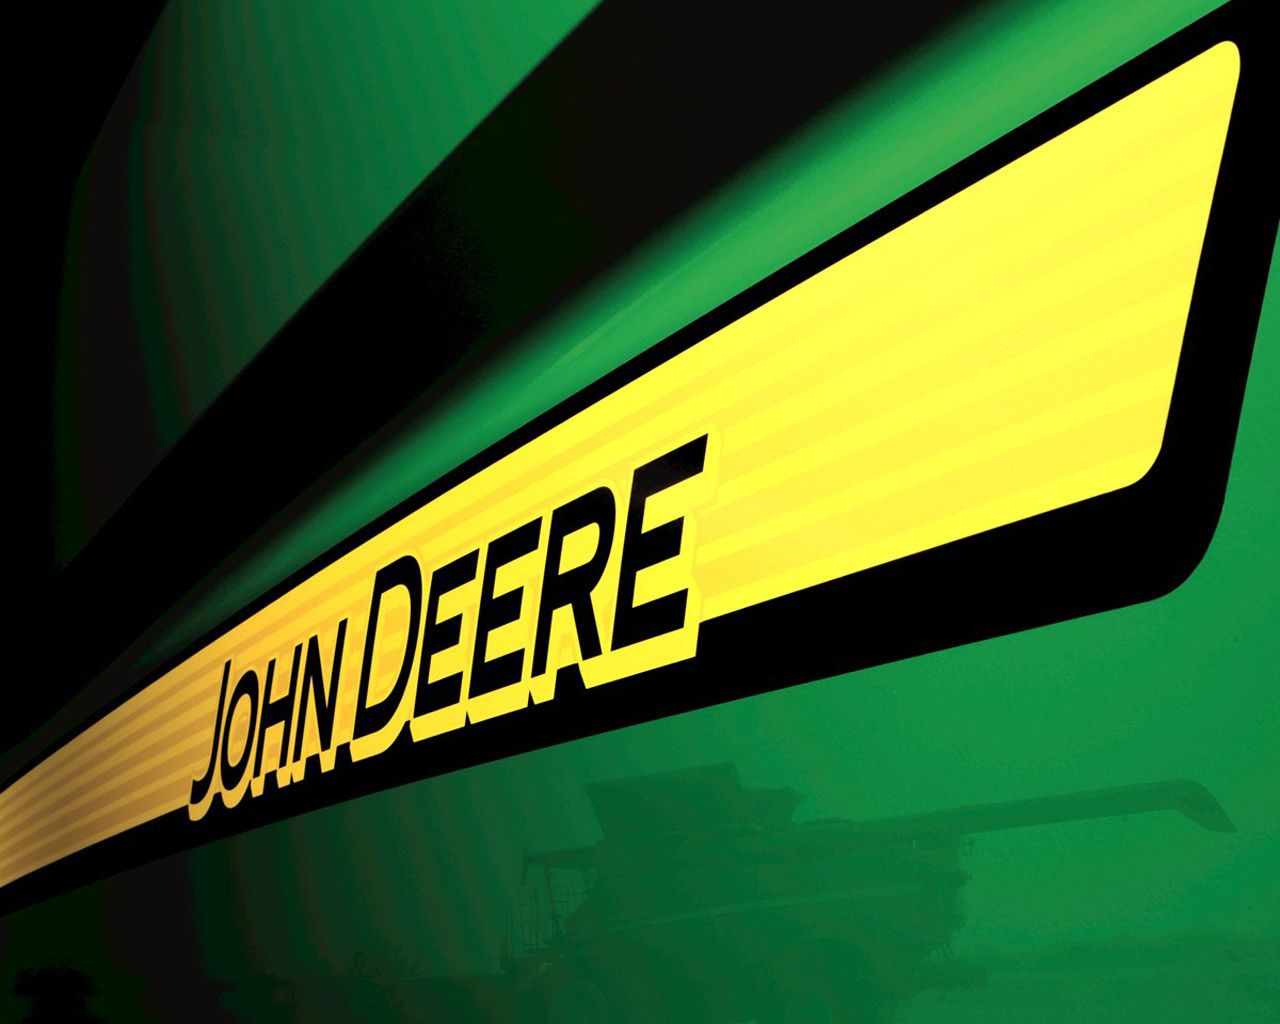 Ausmalbilder Traktor Mit Ladewagen : John Deere 1280x1024px Wallpapers John Deere Logos Pinterest